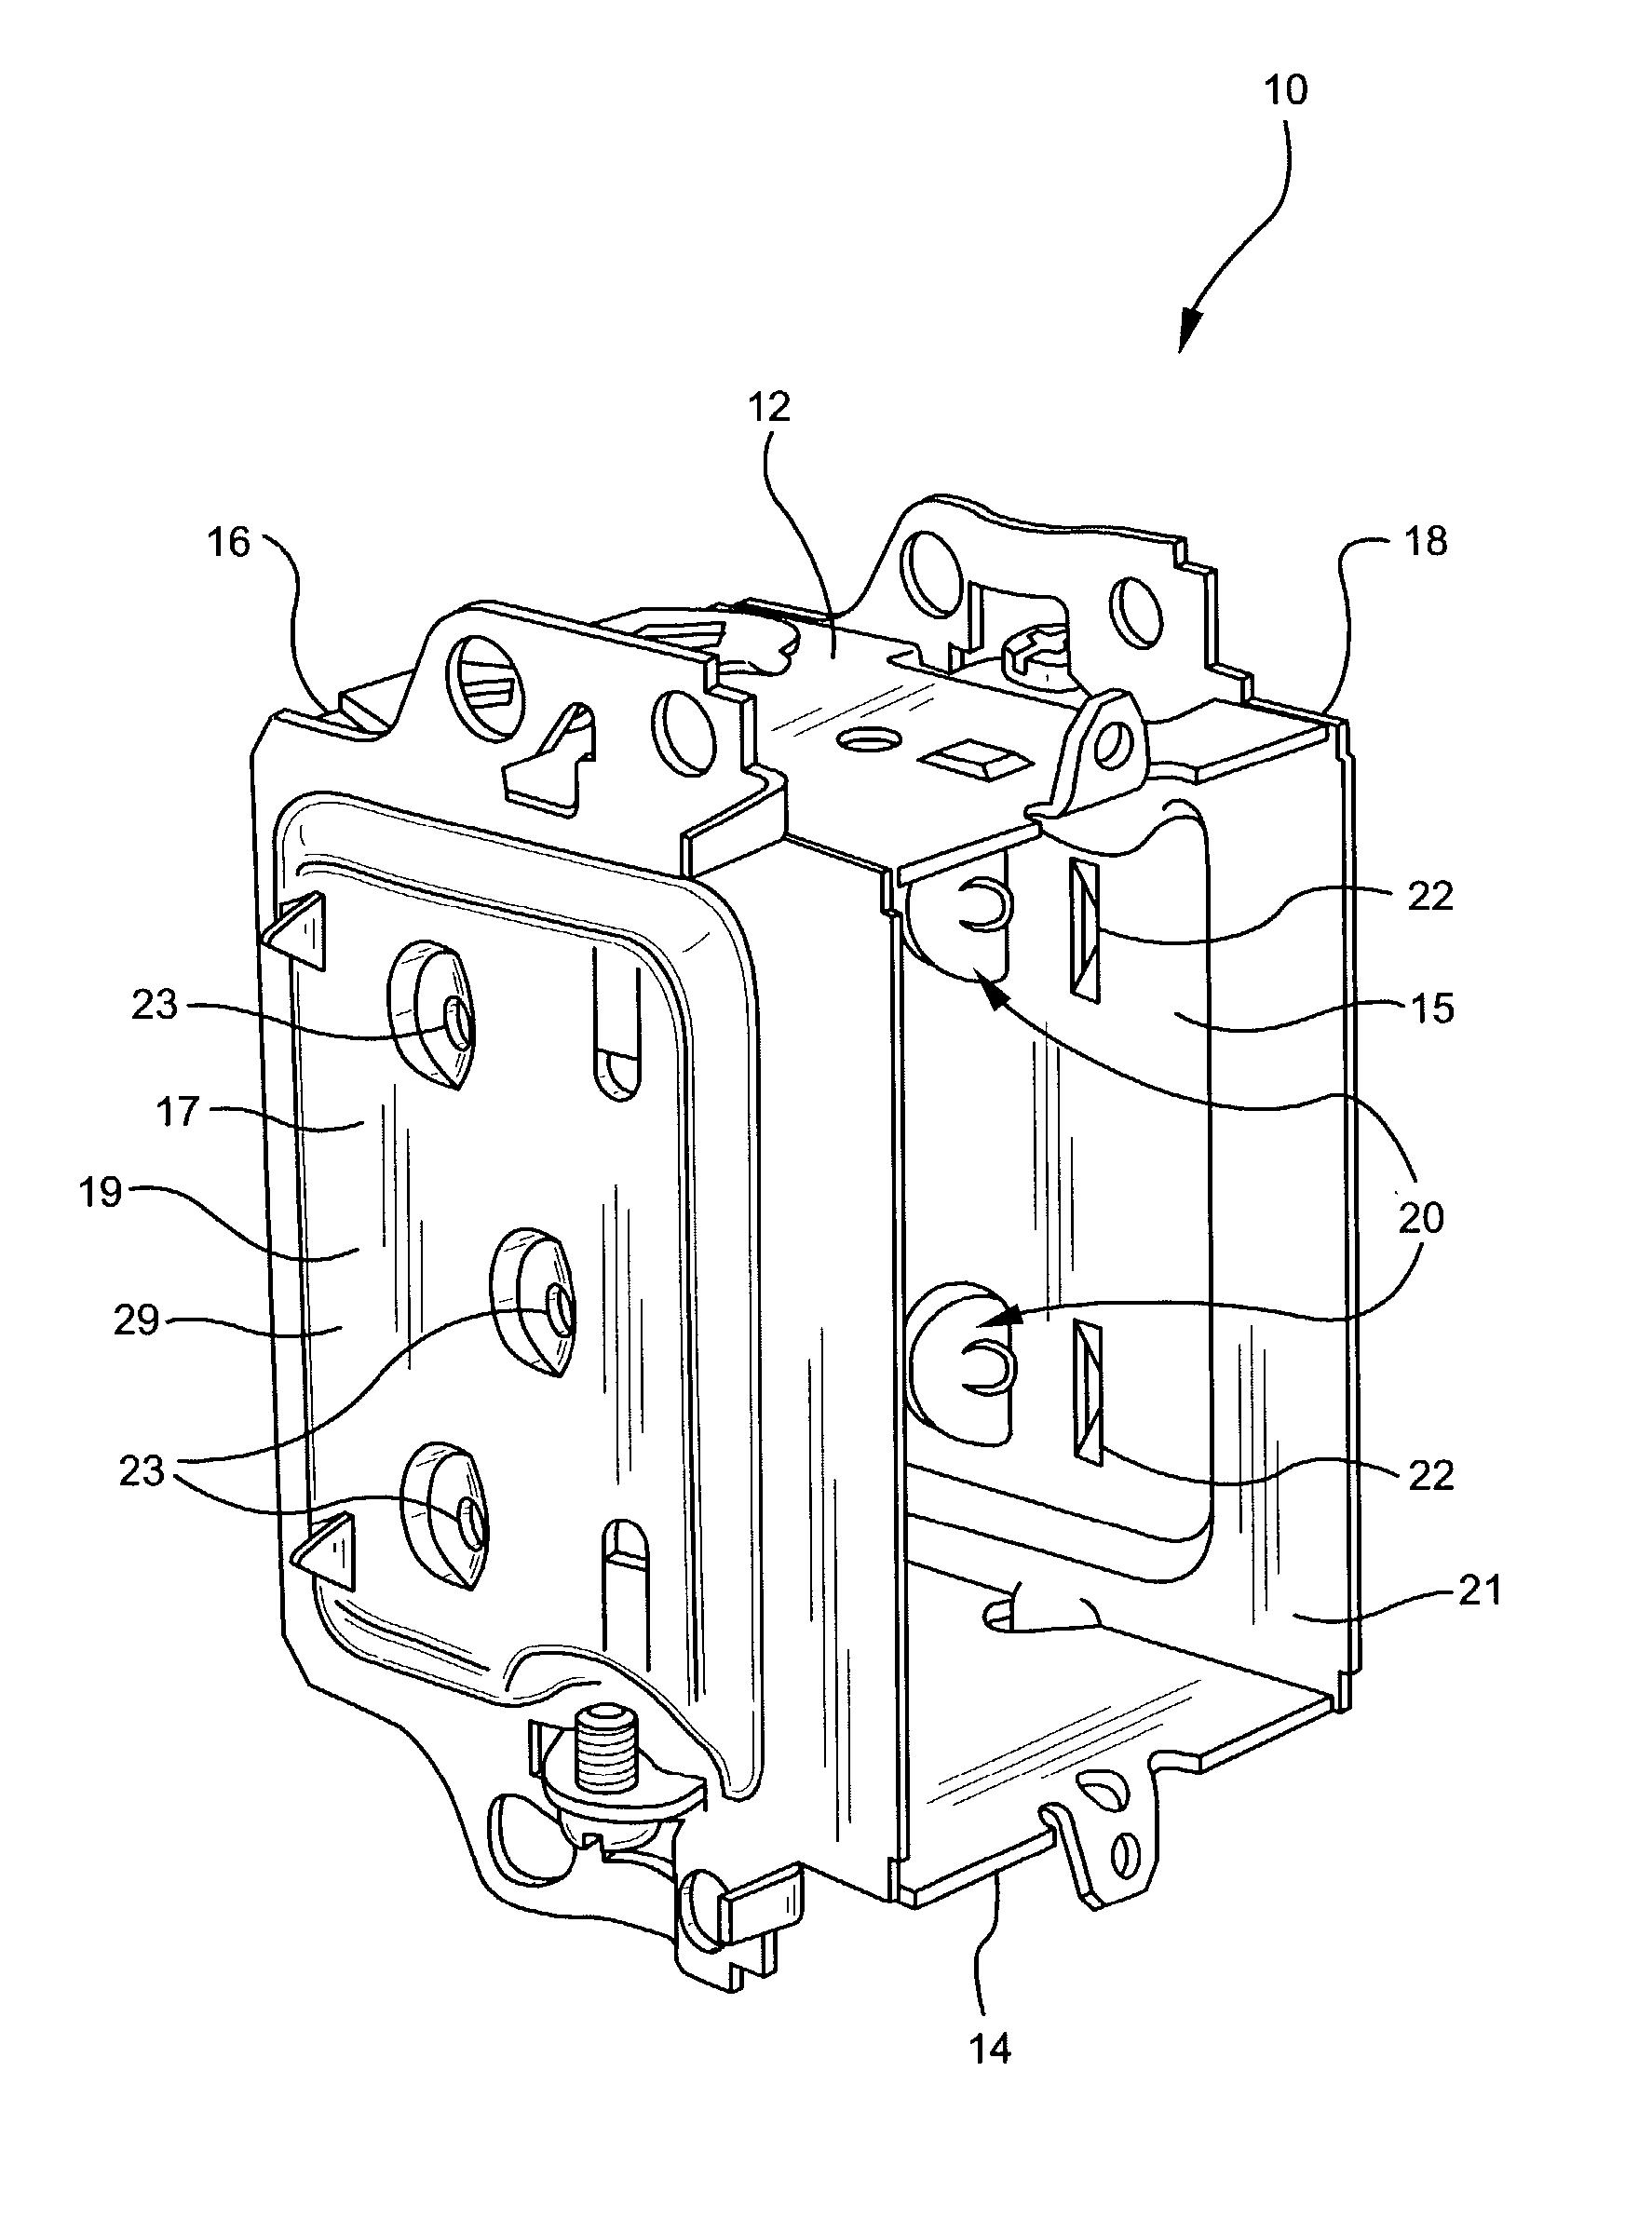 flush junction box covers  flush  free engine image for